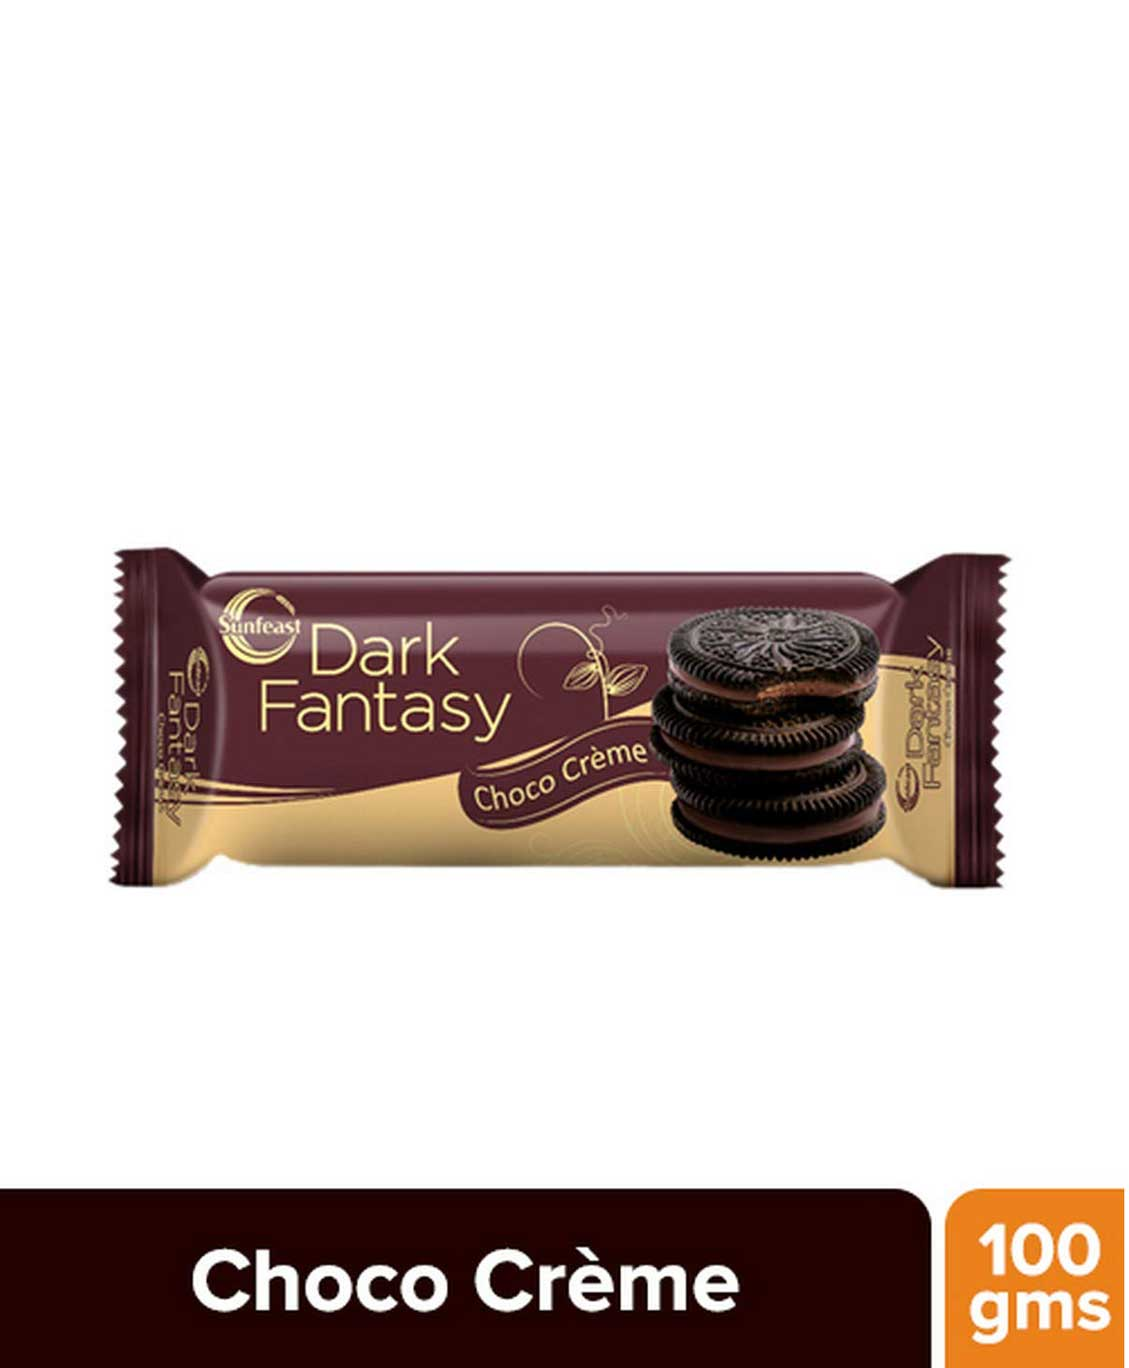 Sunfeast Dark Fantasy Chocolate 100 g